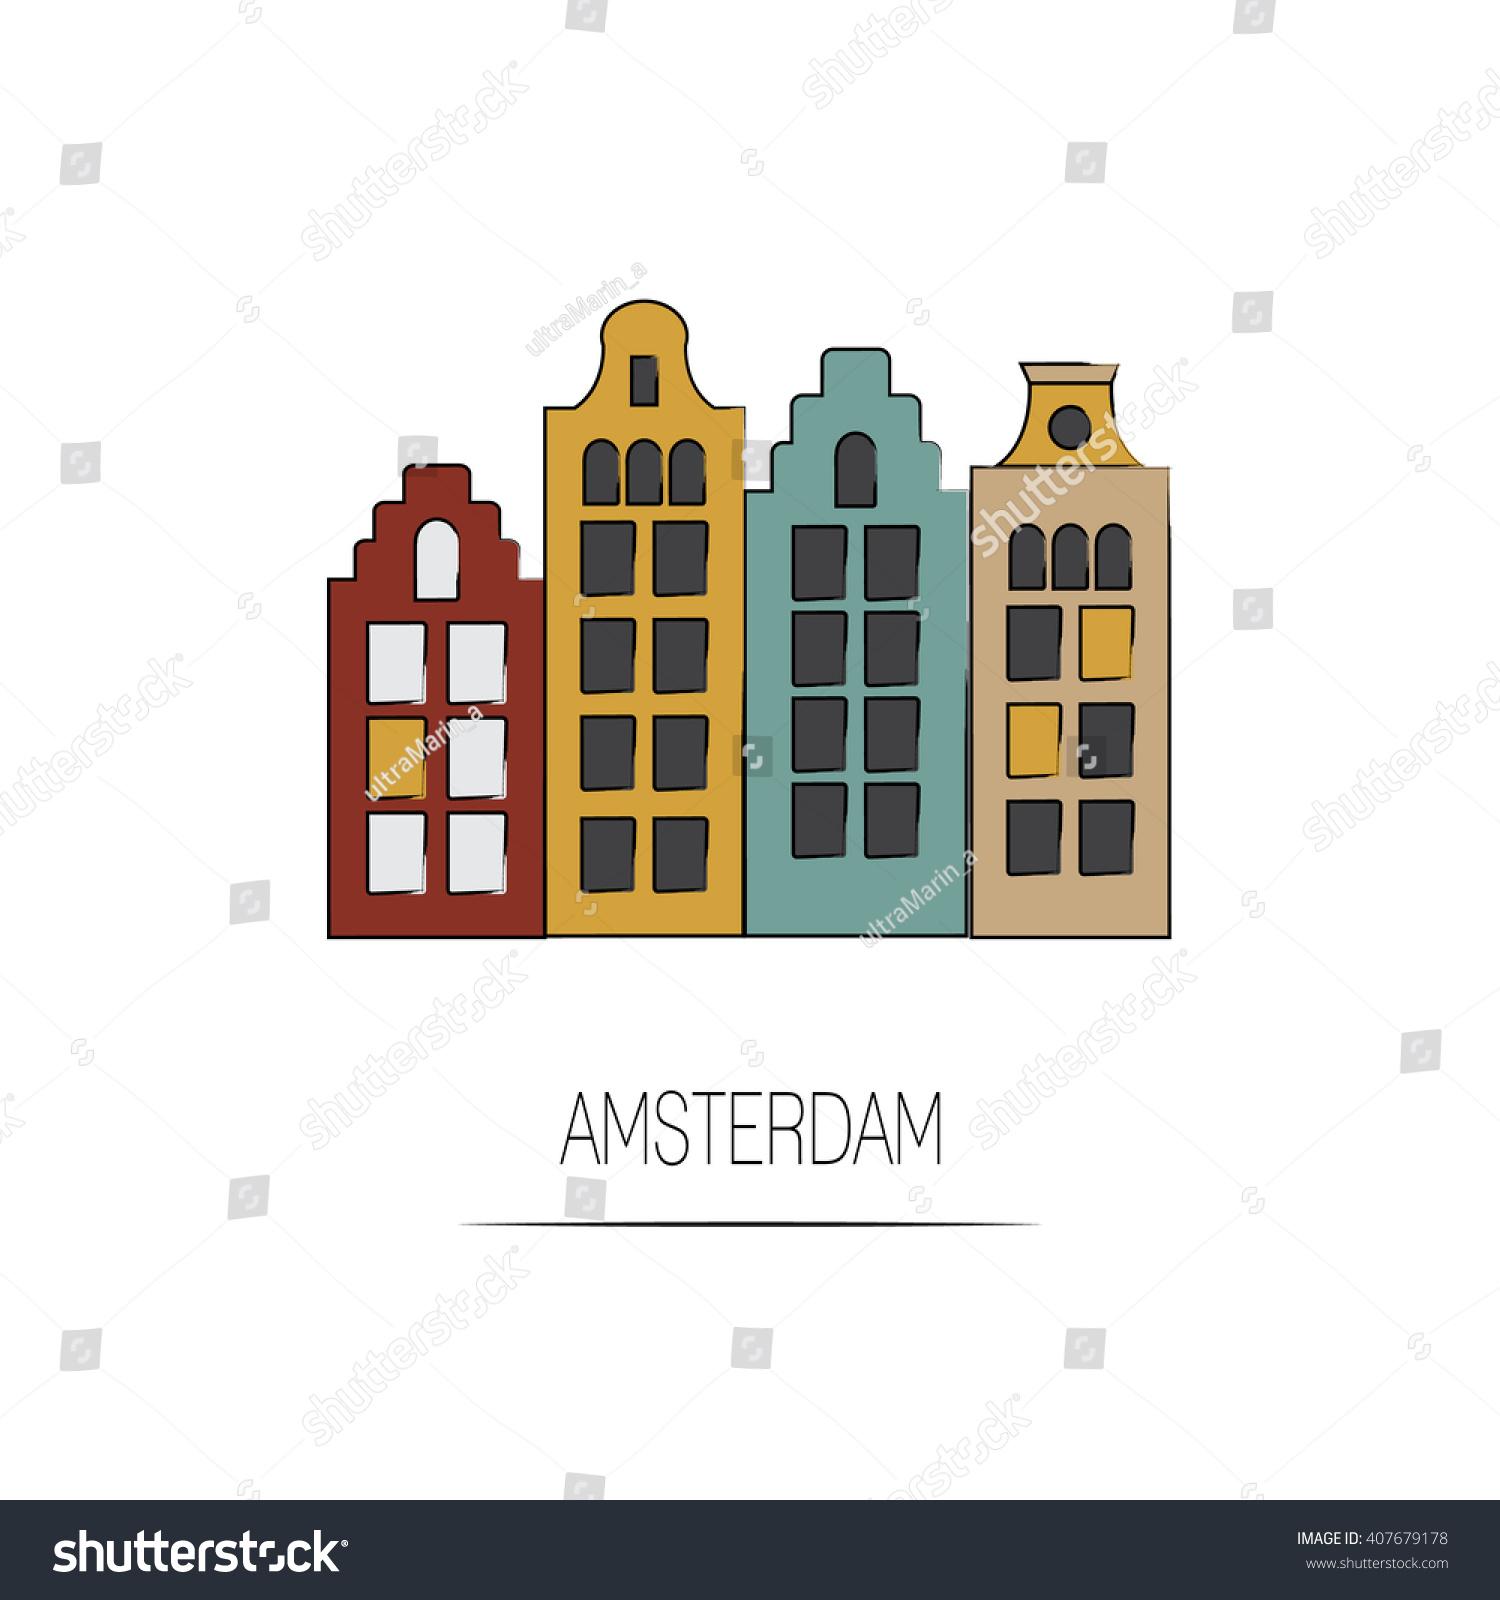 Vector Amsterdam Icon. City Line Illustration. Traditional